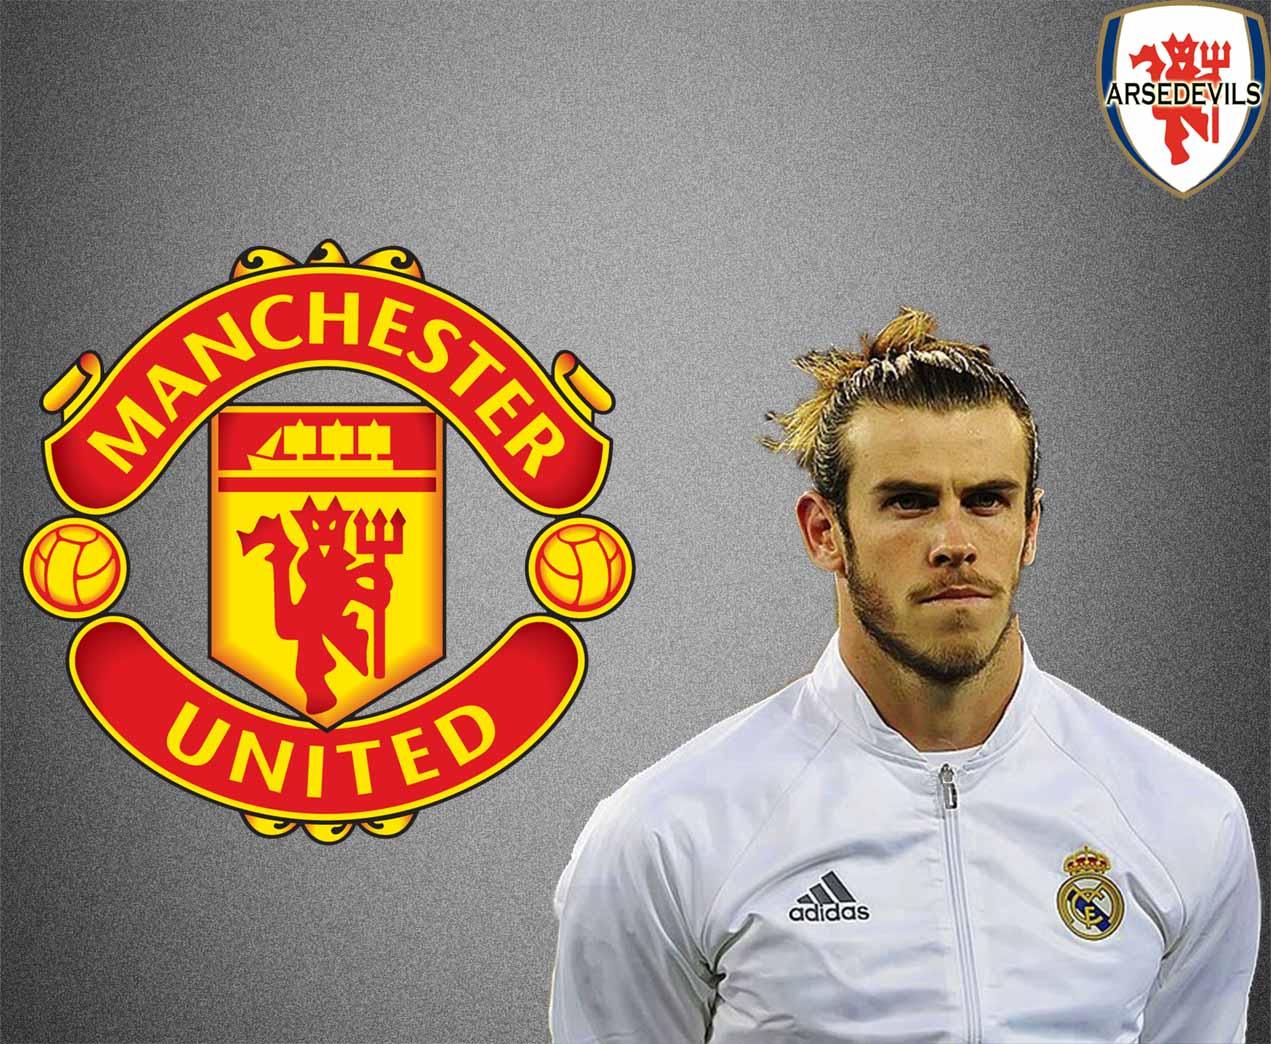 Gareth Bale, Arsedevils, Manchester United